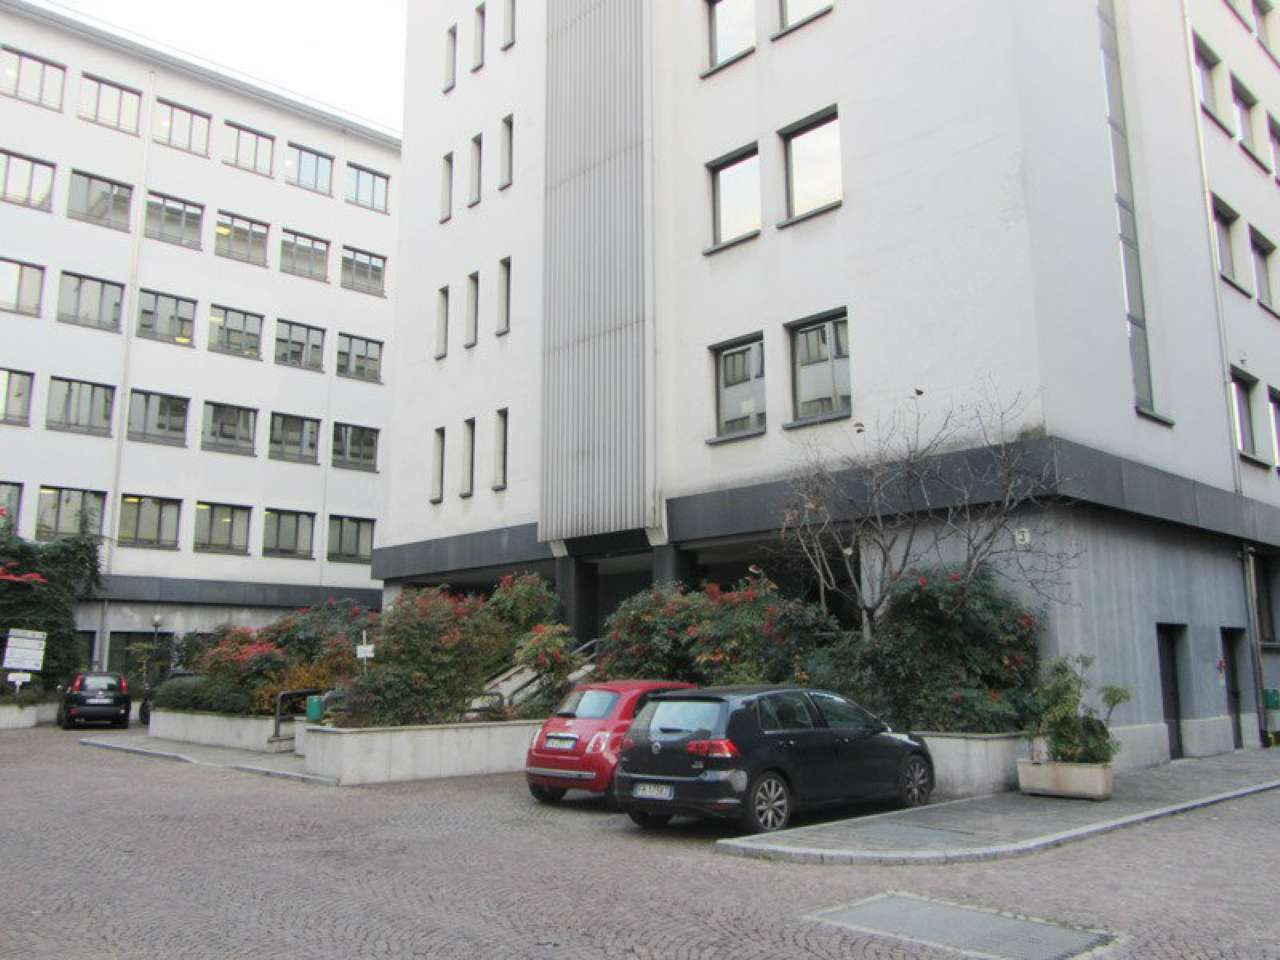 Ufficio in vendita Zona Affori, Bovisa, Niguarda, Testi, Br... - via Durando 38 Milano